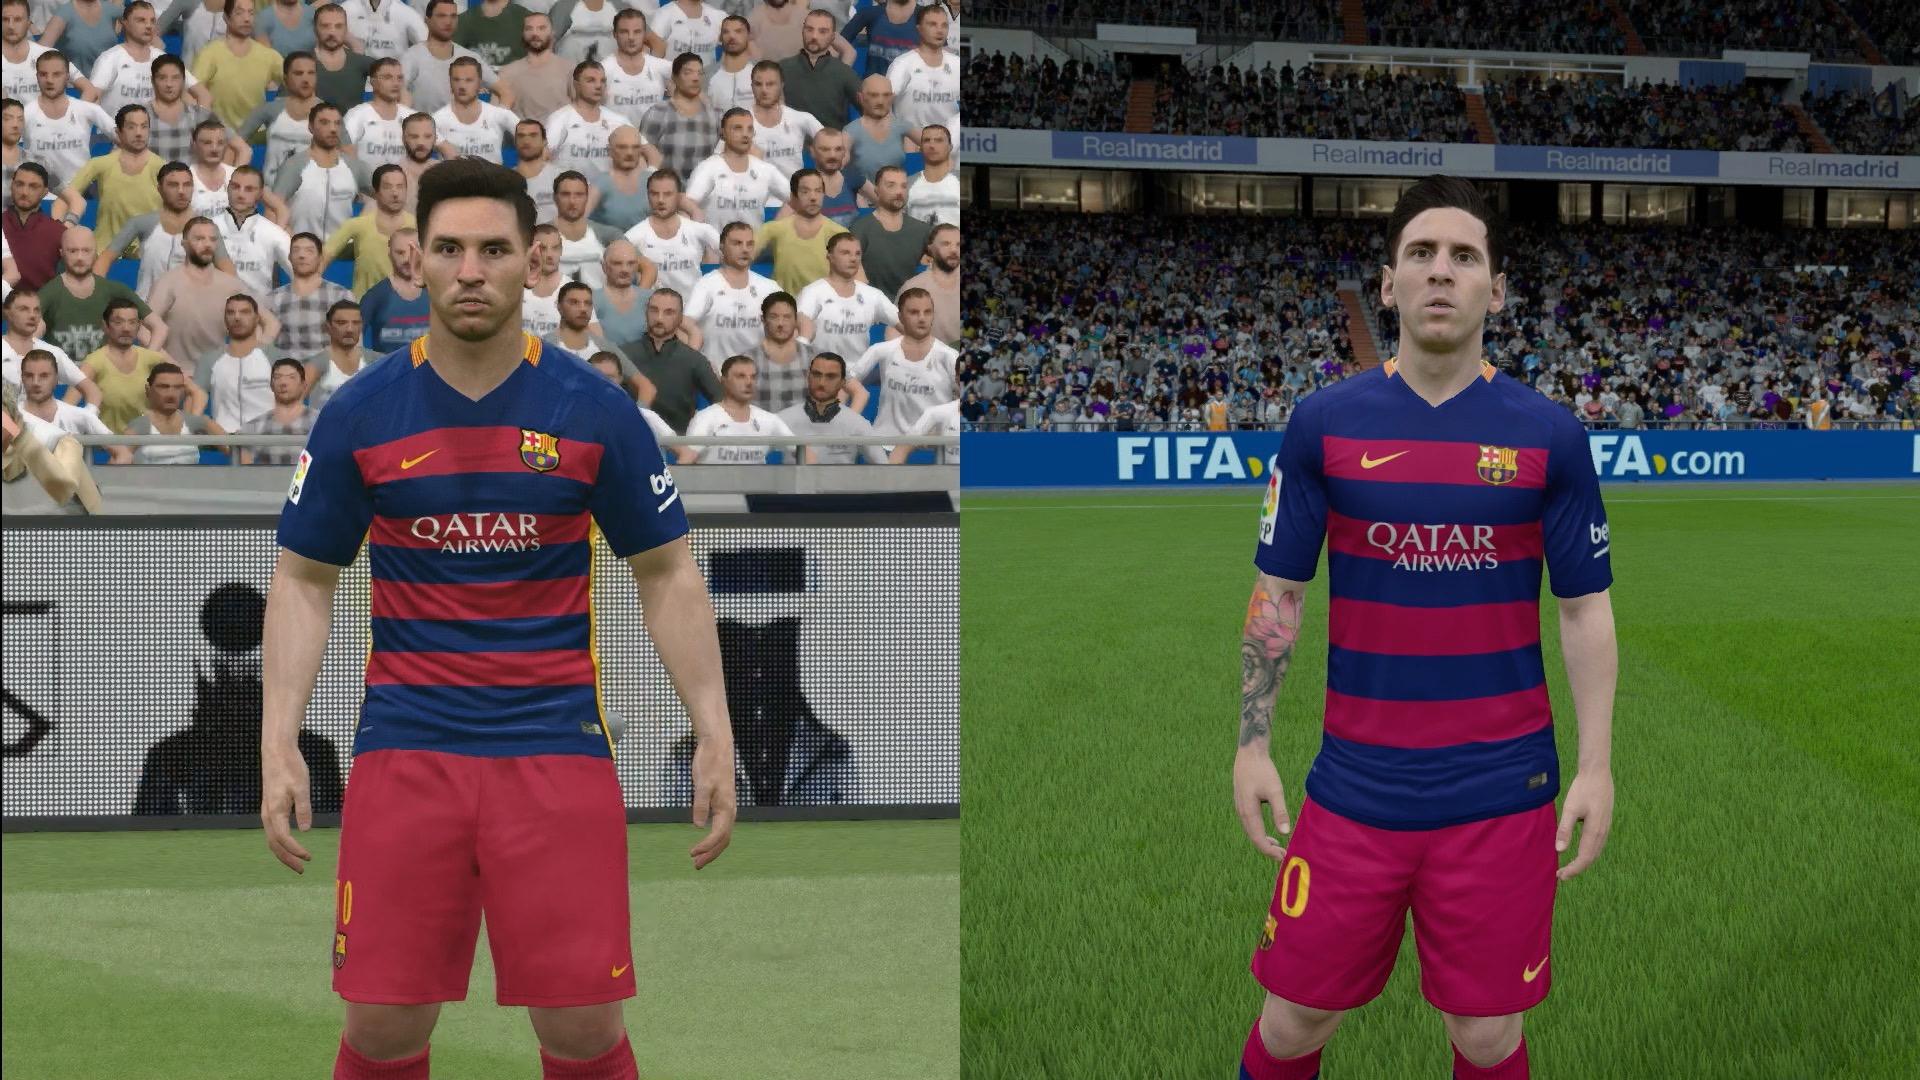 de7e2c3a7b FIFA 16 vs. PES 2016 - Video-Grafikvergleich der PC-Versionen